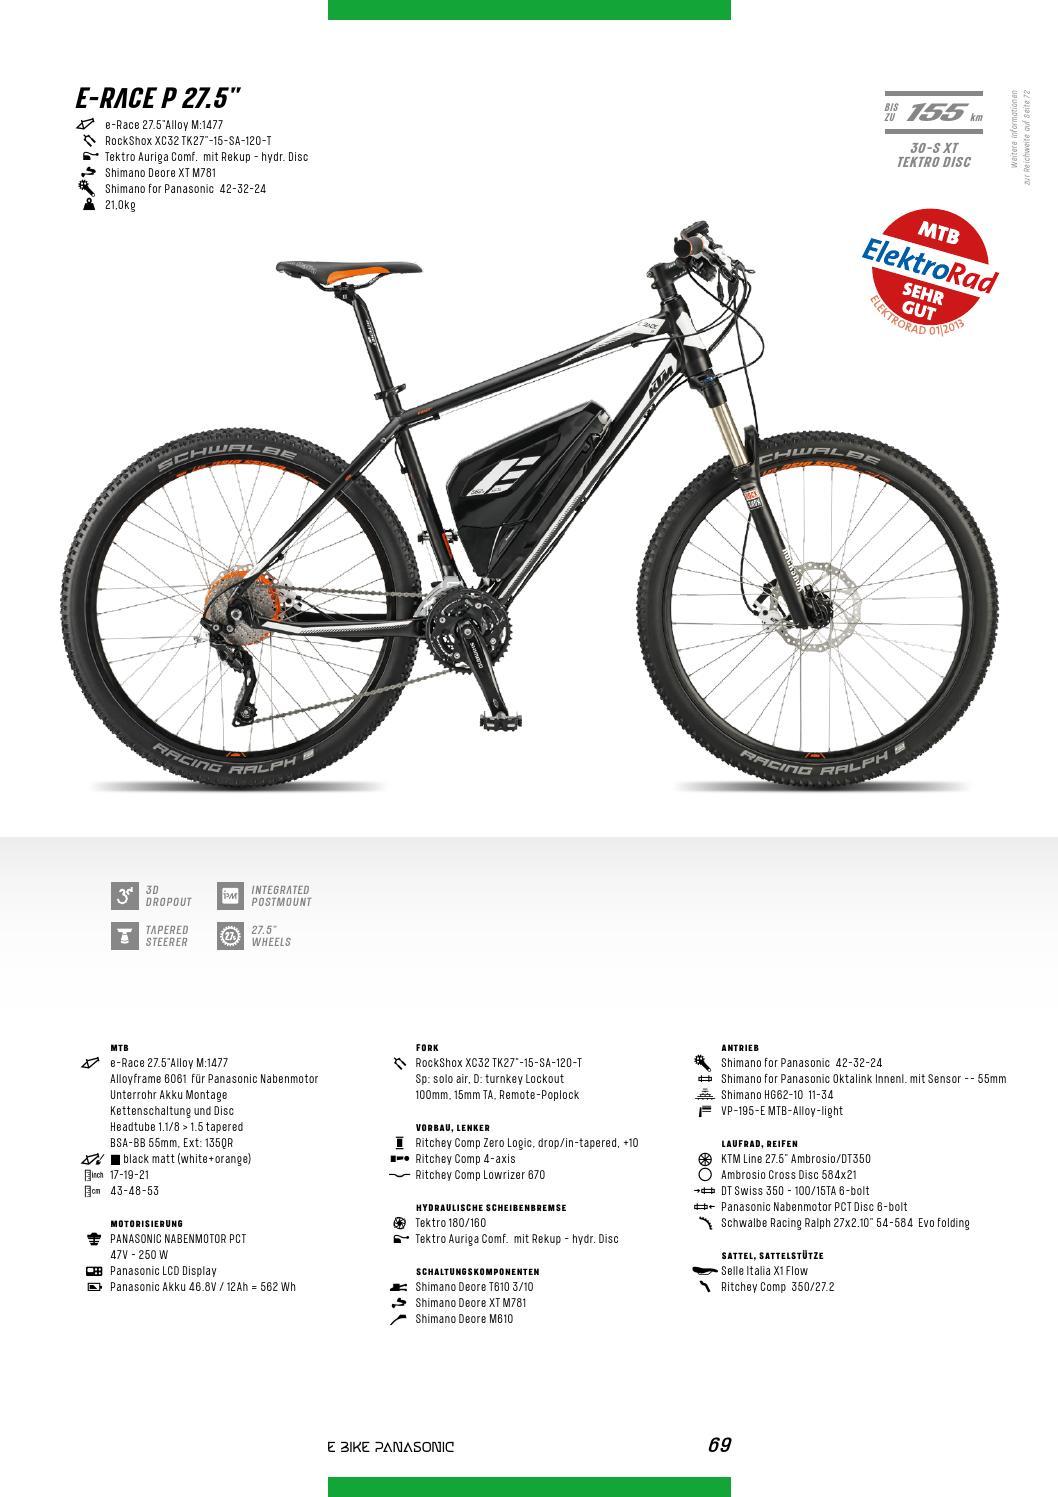 Ktm E Bike Catalog 2015 By Ktm Bike Industries Issuu